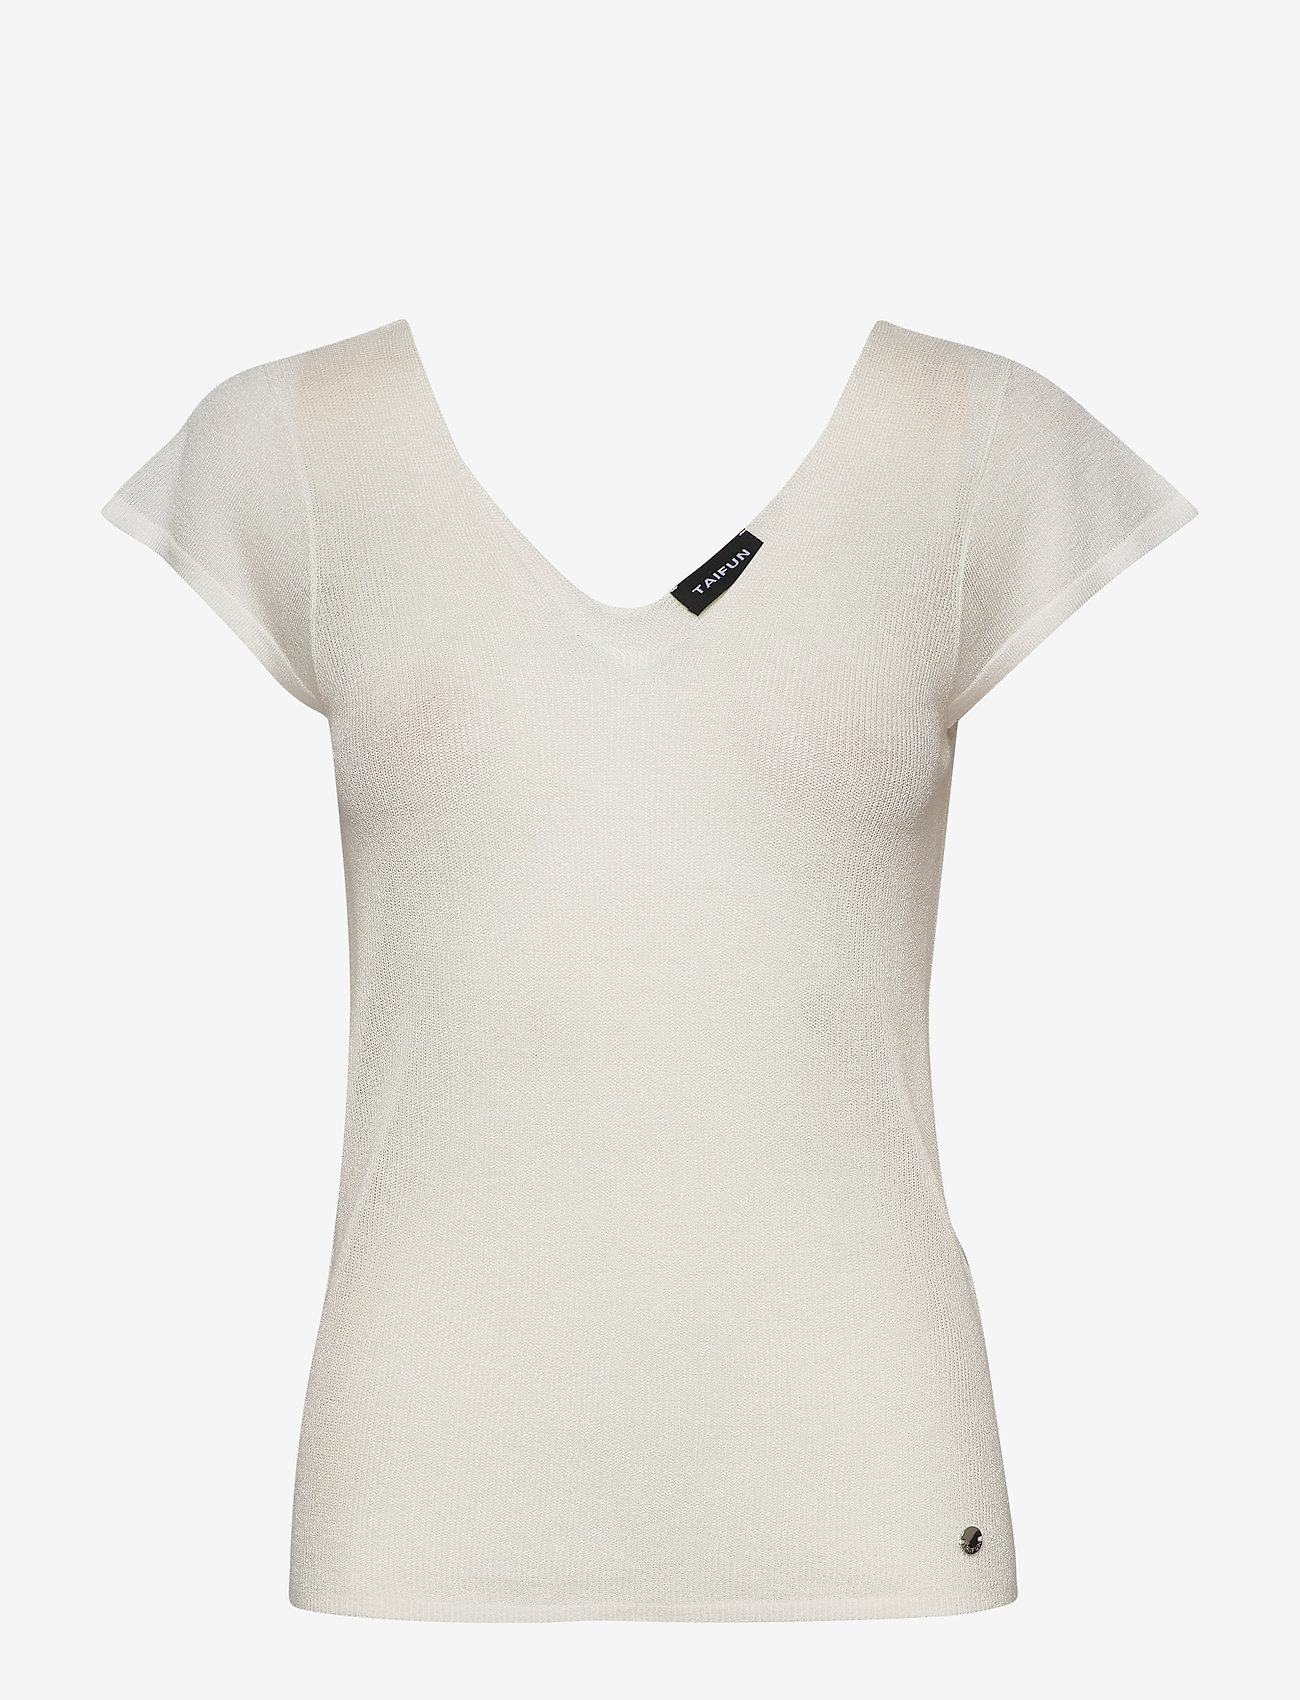 Taifun - TOP KNITWEAR - stickade toppar & t-shirts - offwhite - 0